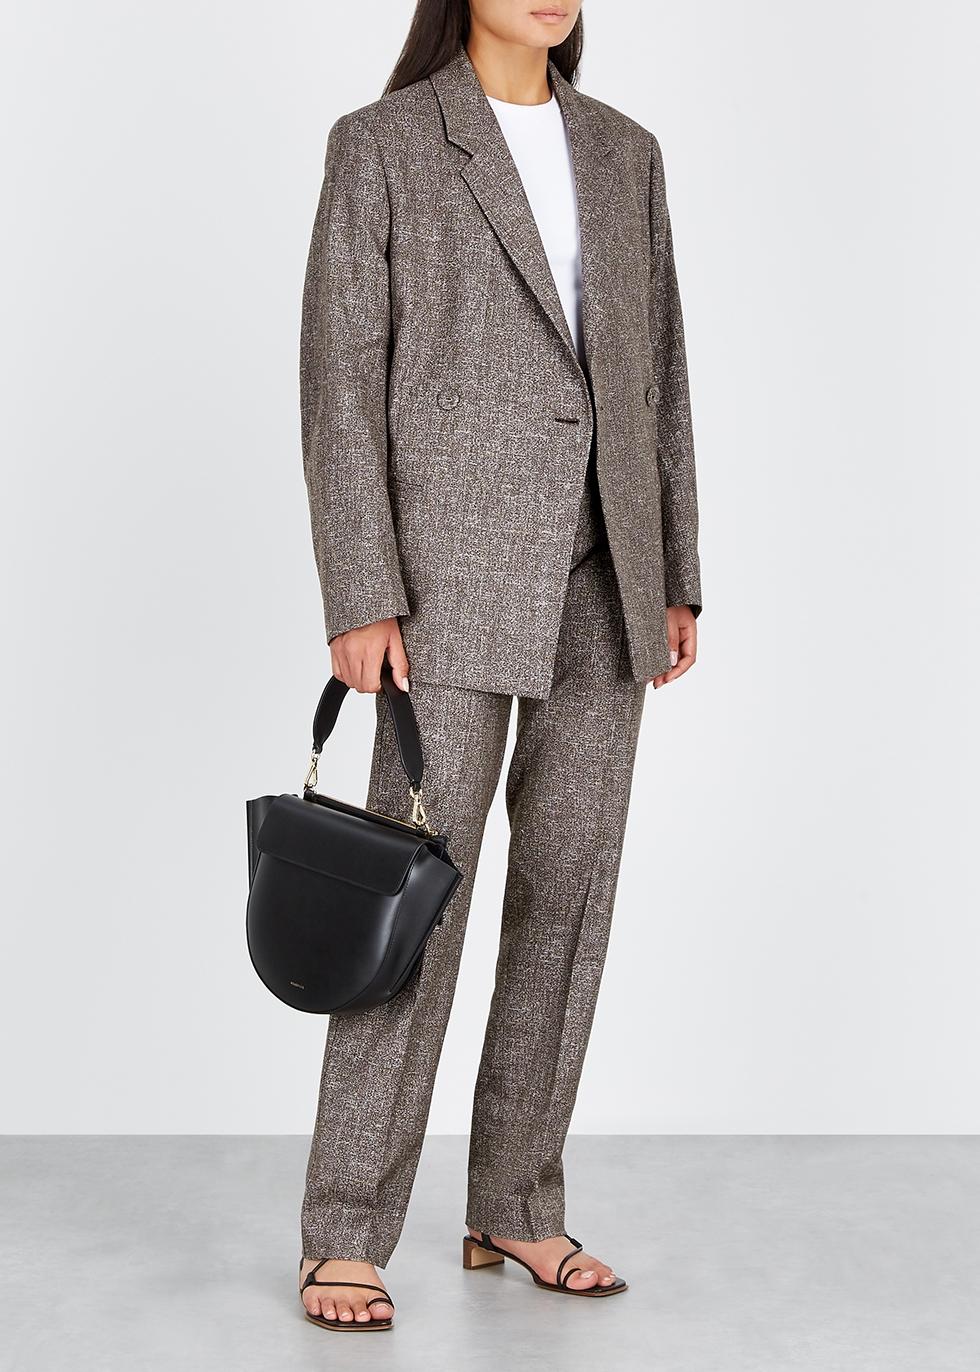 3c59f170f452 Women's Designer Suits & Co-ords - Harvey Nichols